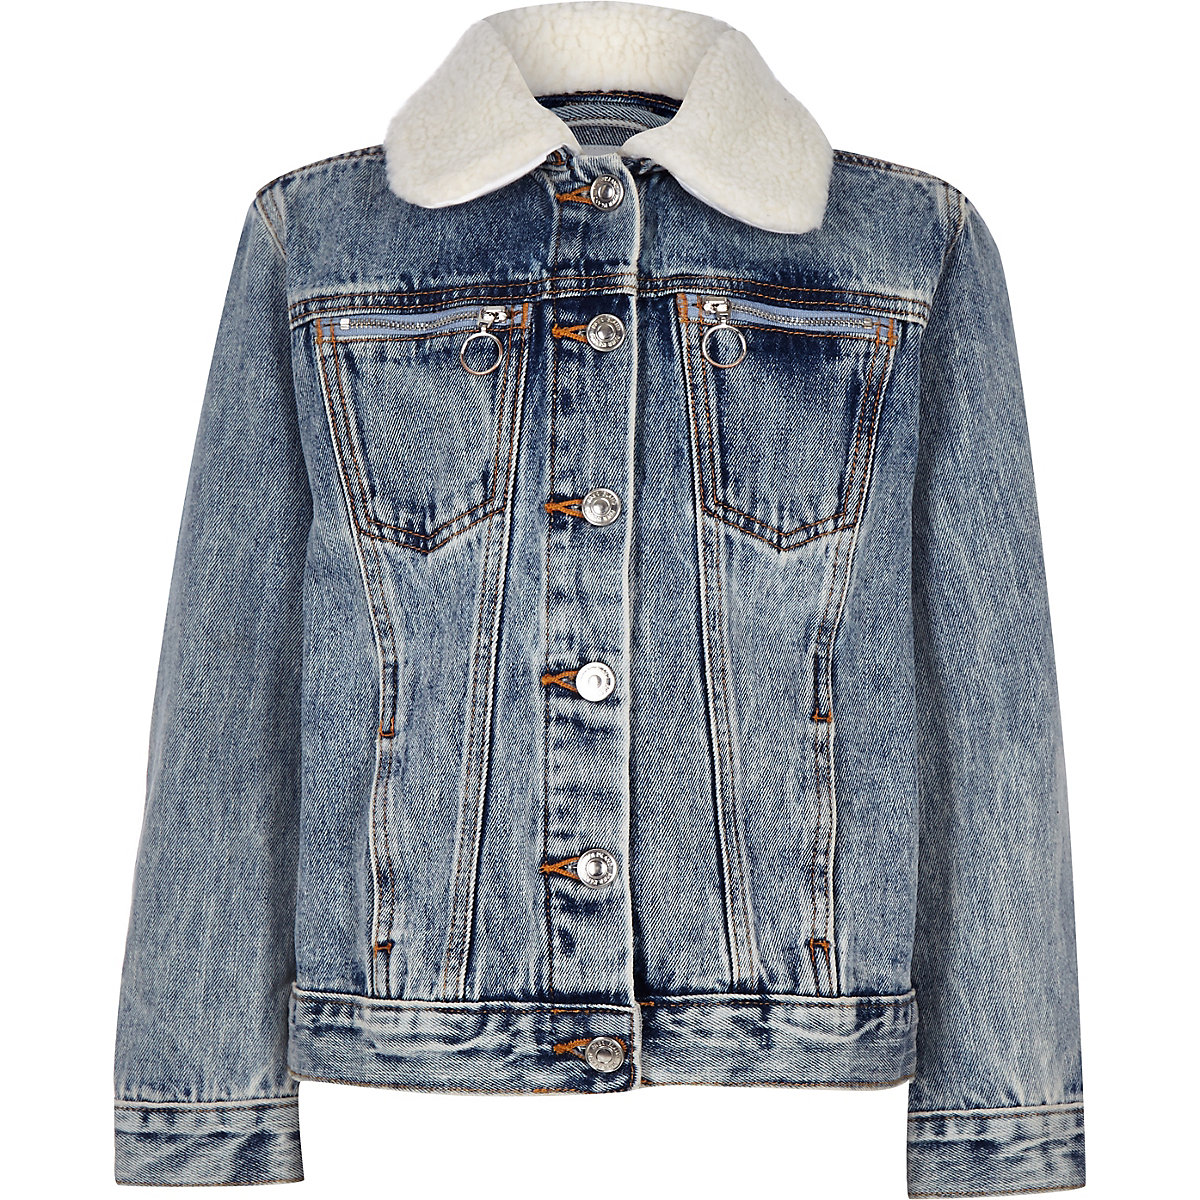 Kids blue Denim Jacket Borg Collar